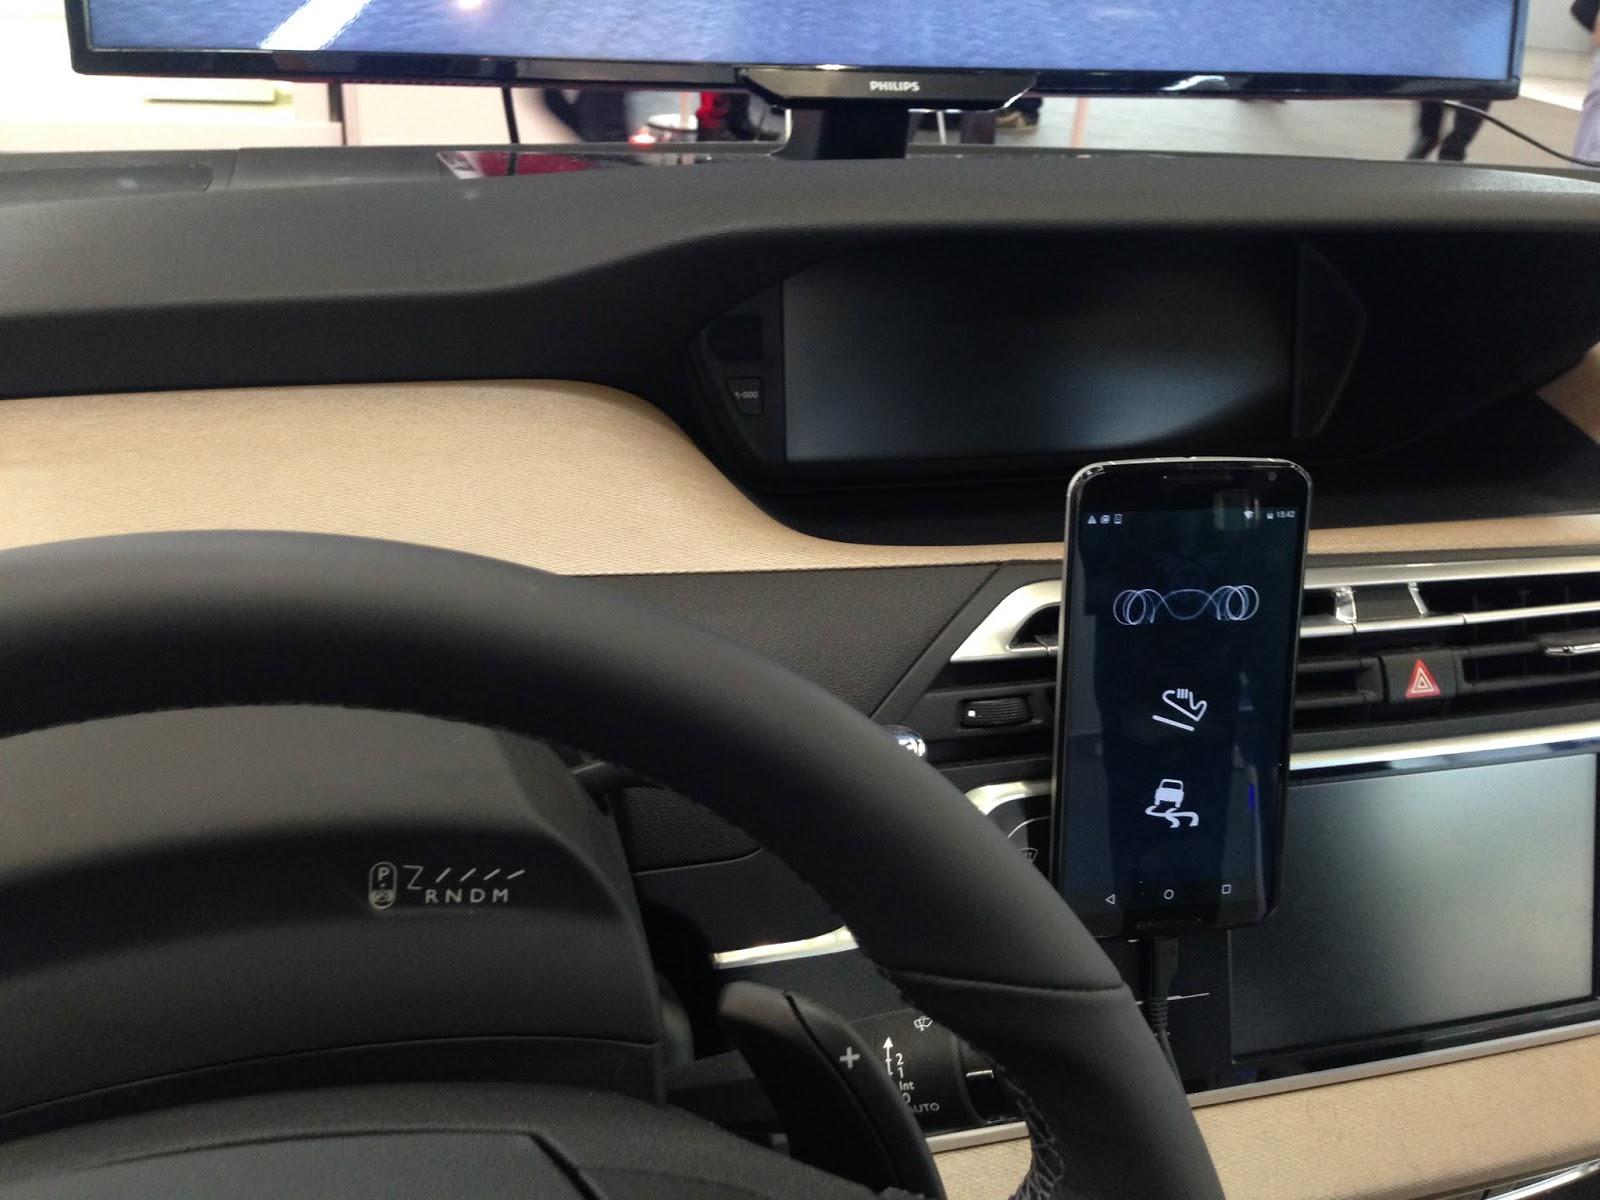 voiture du futur car safety apps le mariage du smartphone et des capteurs du v hicule selon psa. Black Bedroom Furniture Sets. Home Design Ideas